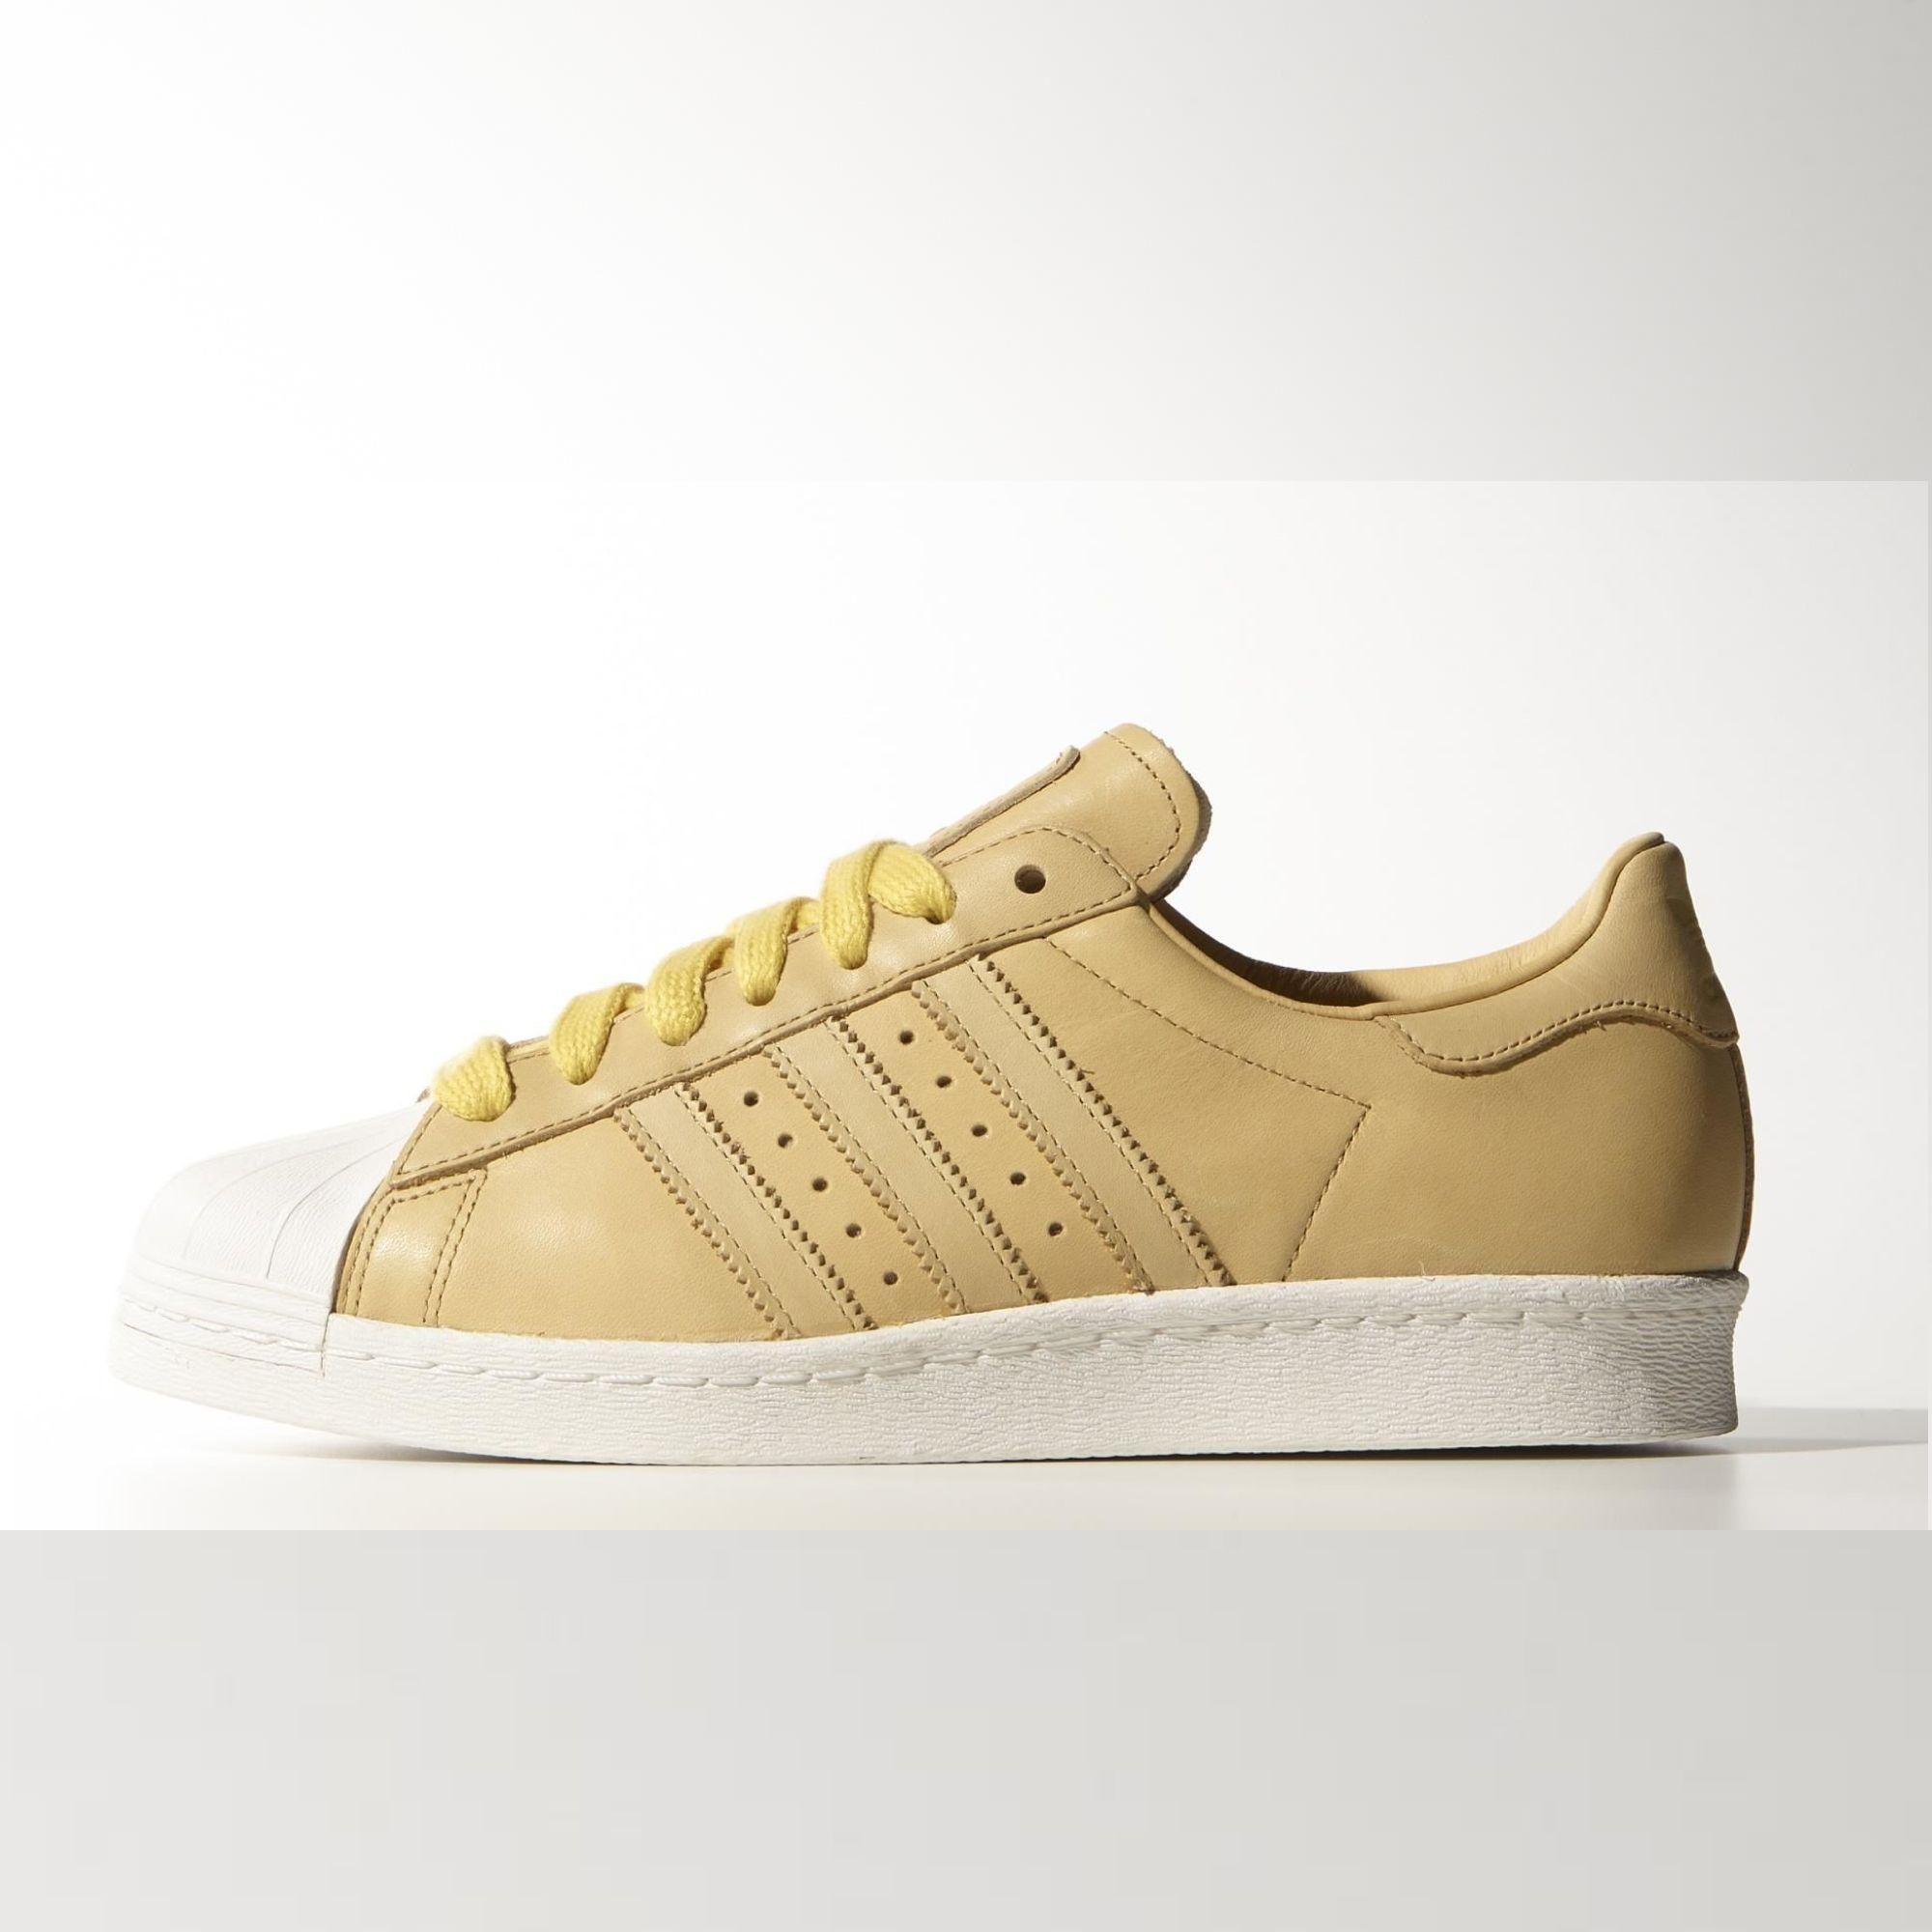 Adidas - Superstar